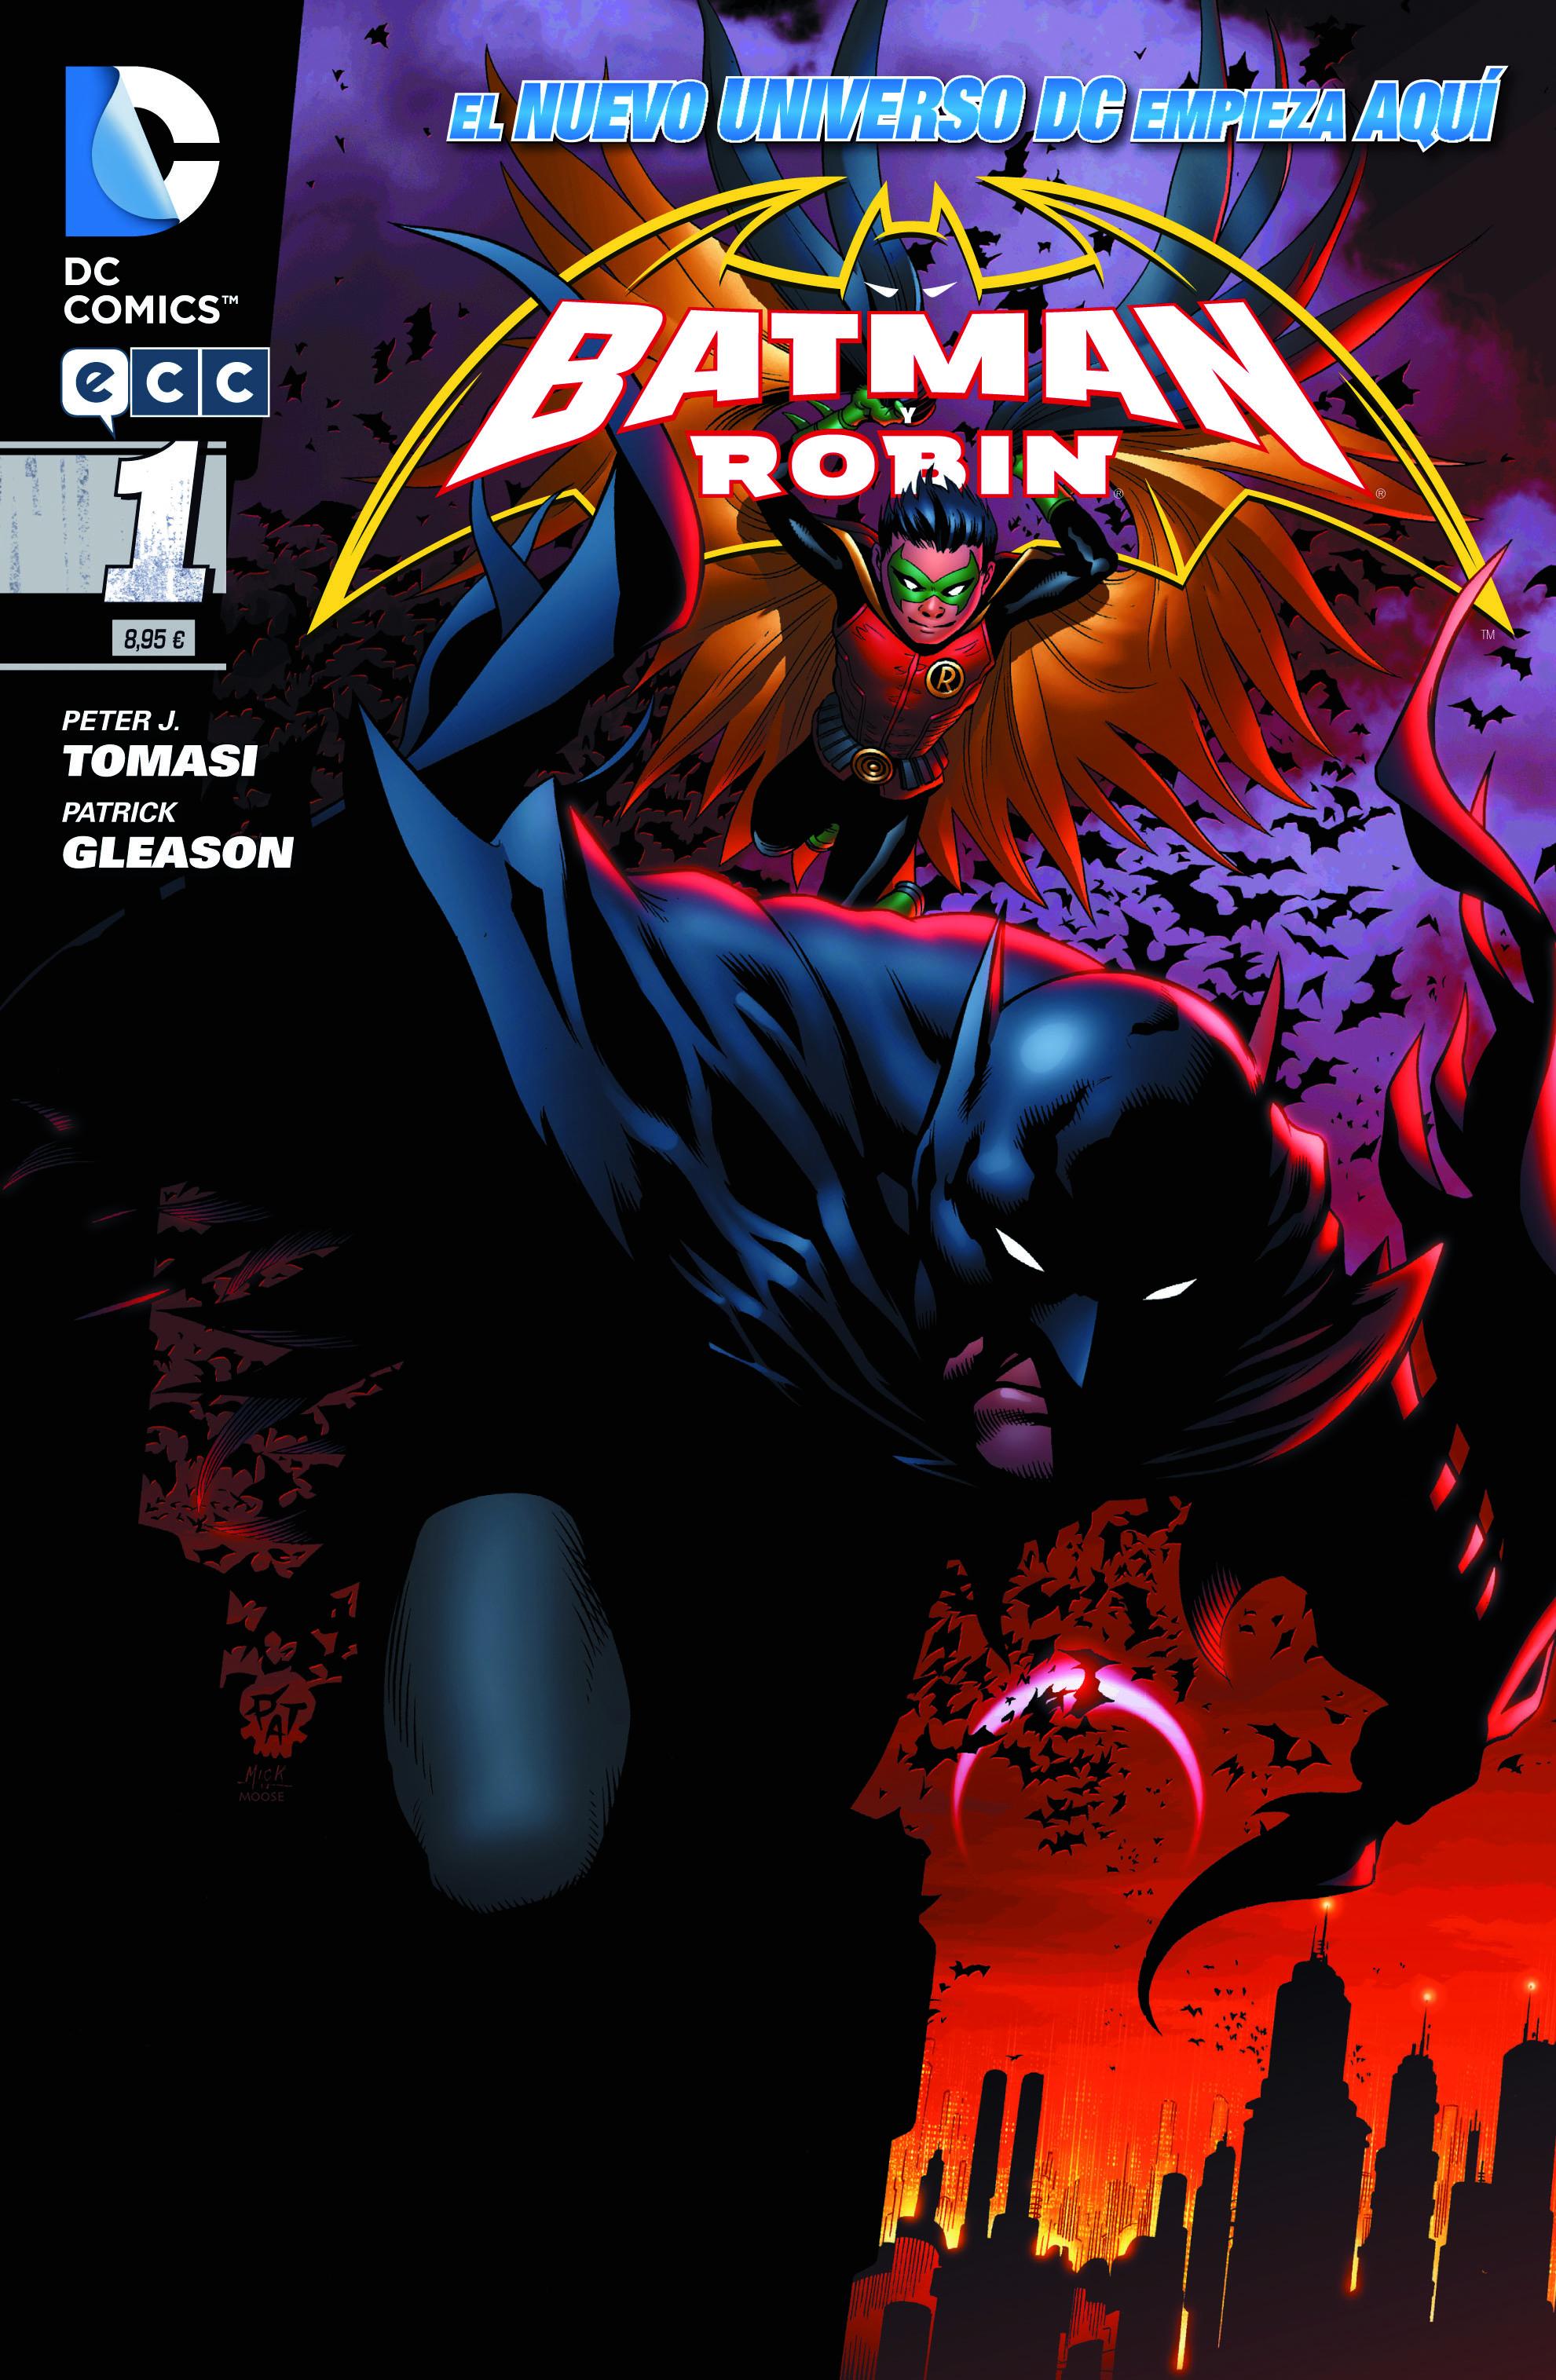 Post Oficial - Nuevo Universo DC Batmanyrobin_1